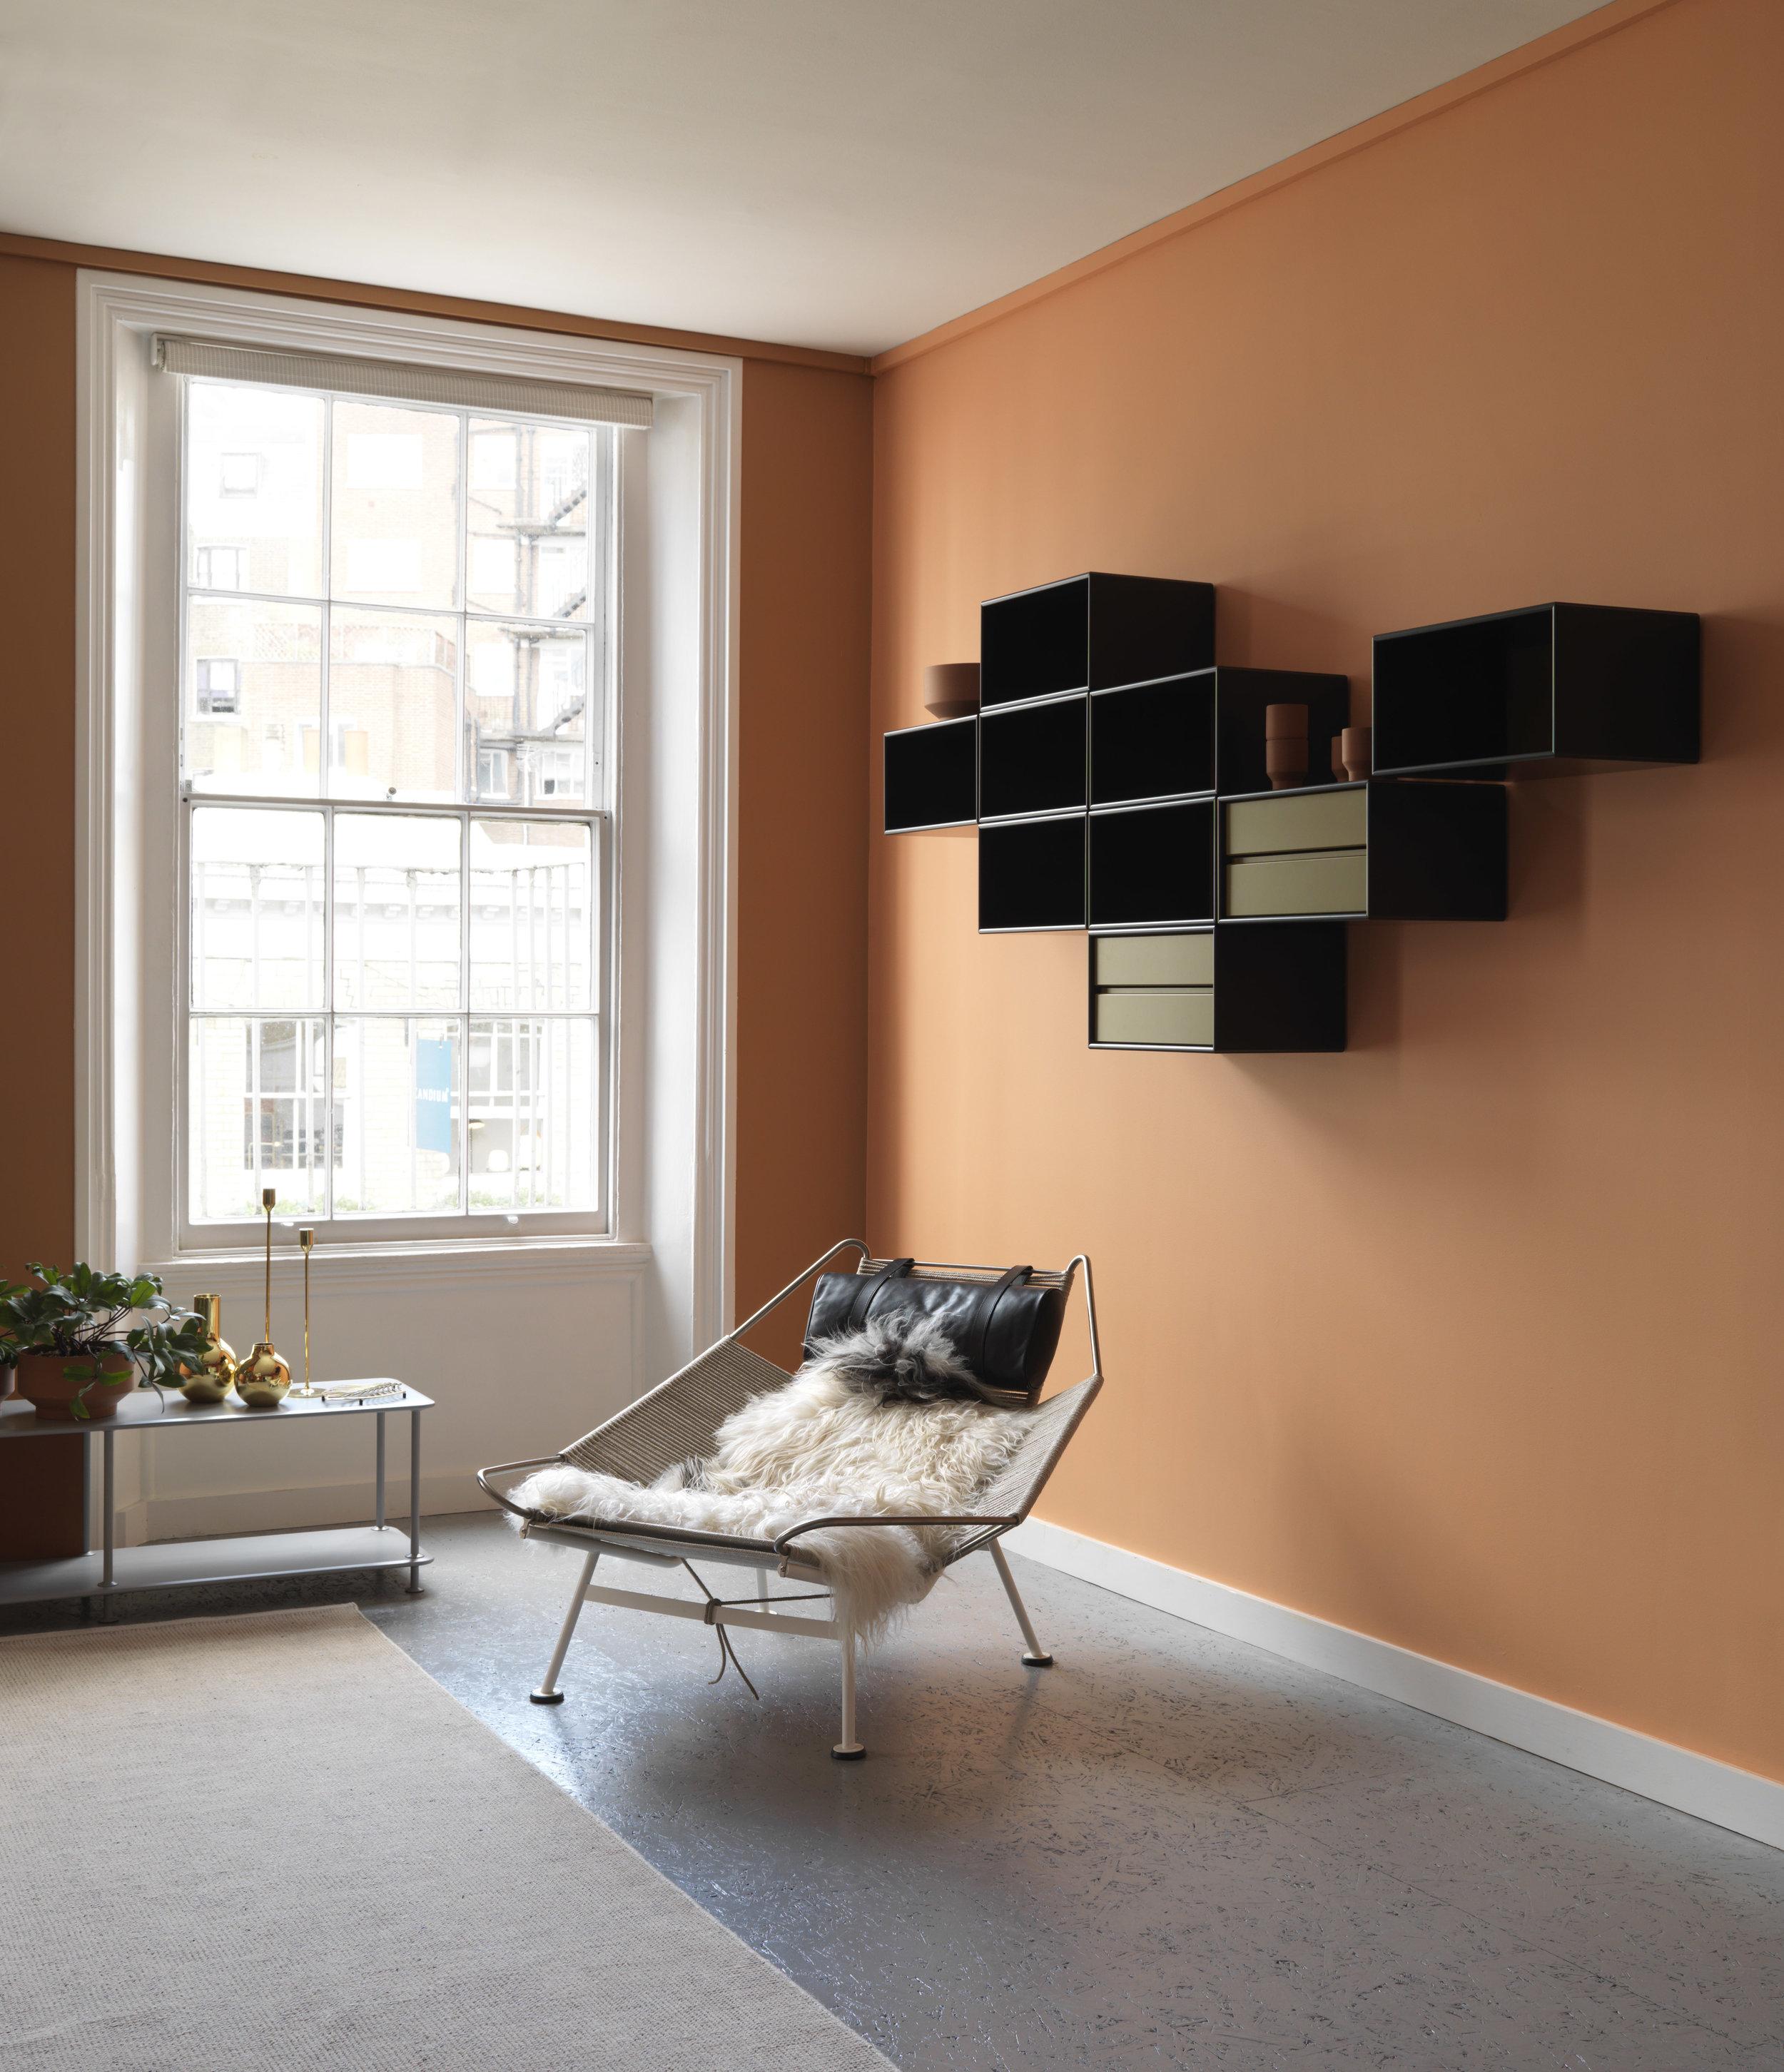 Montana designers Storage and shelving systems London Design Week home interior Scandinavian design Scandinavian home.jpg